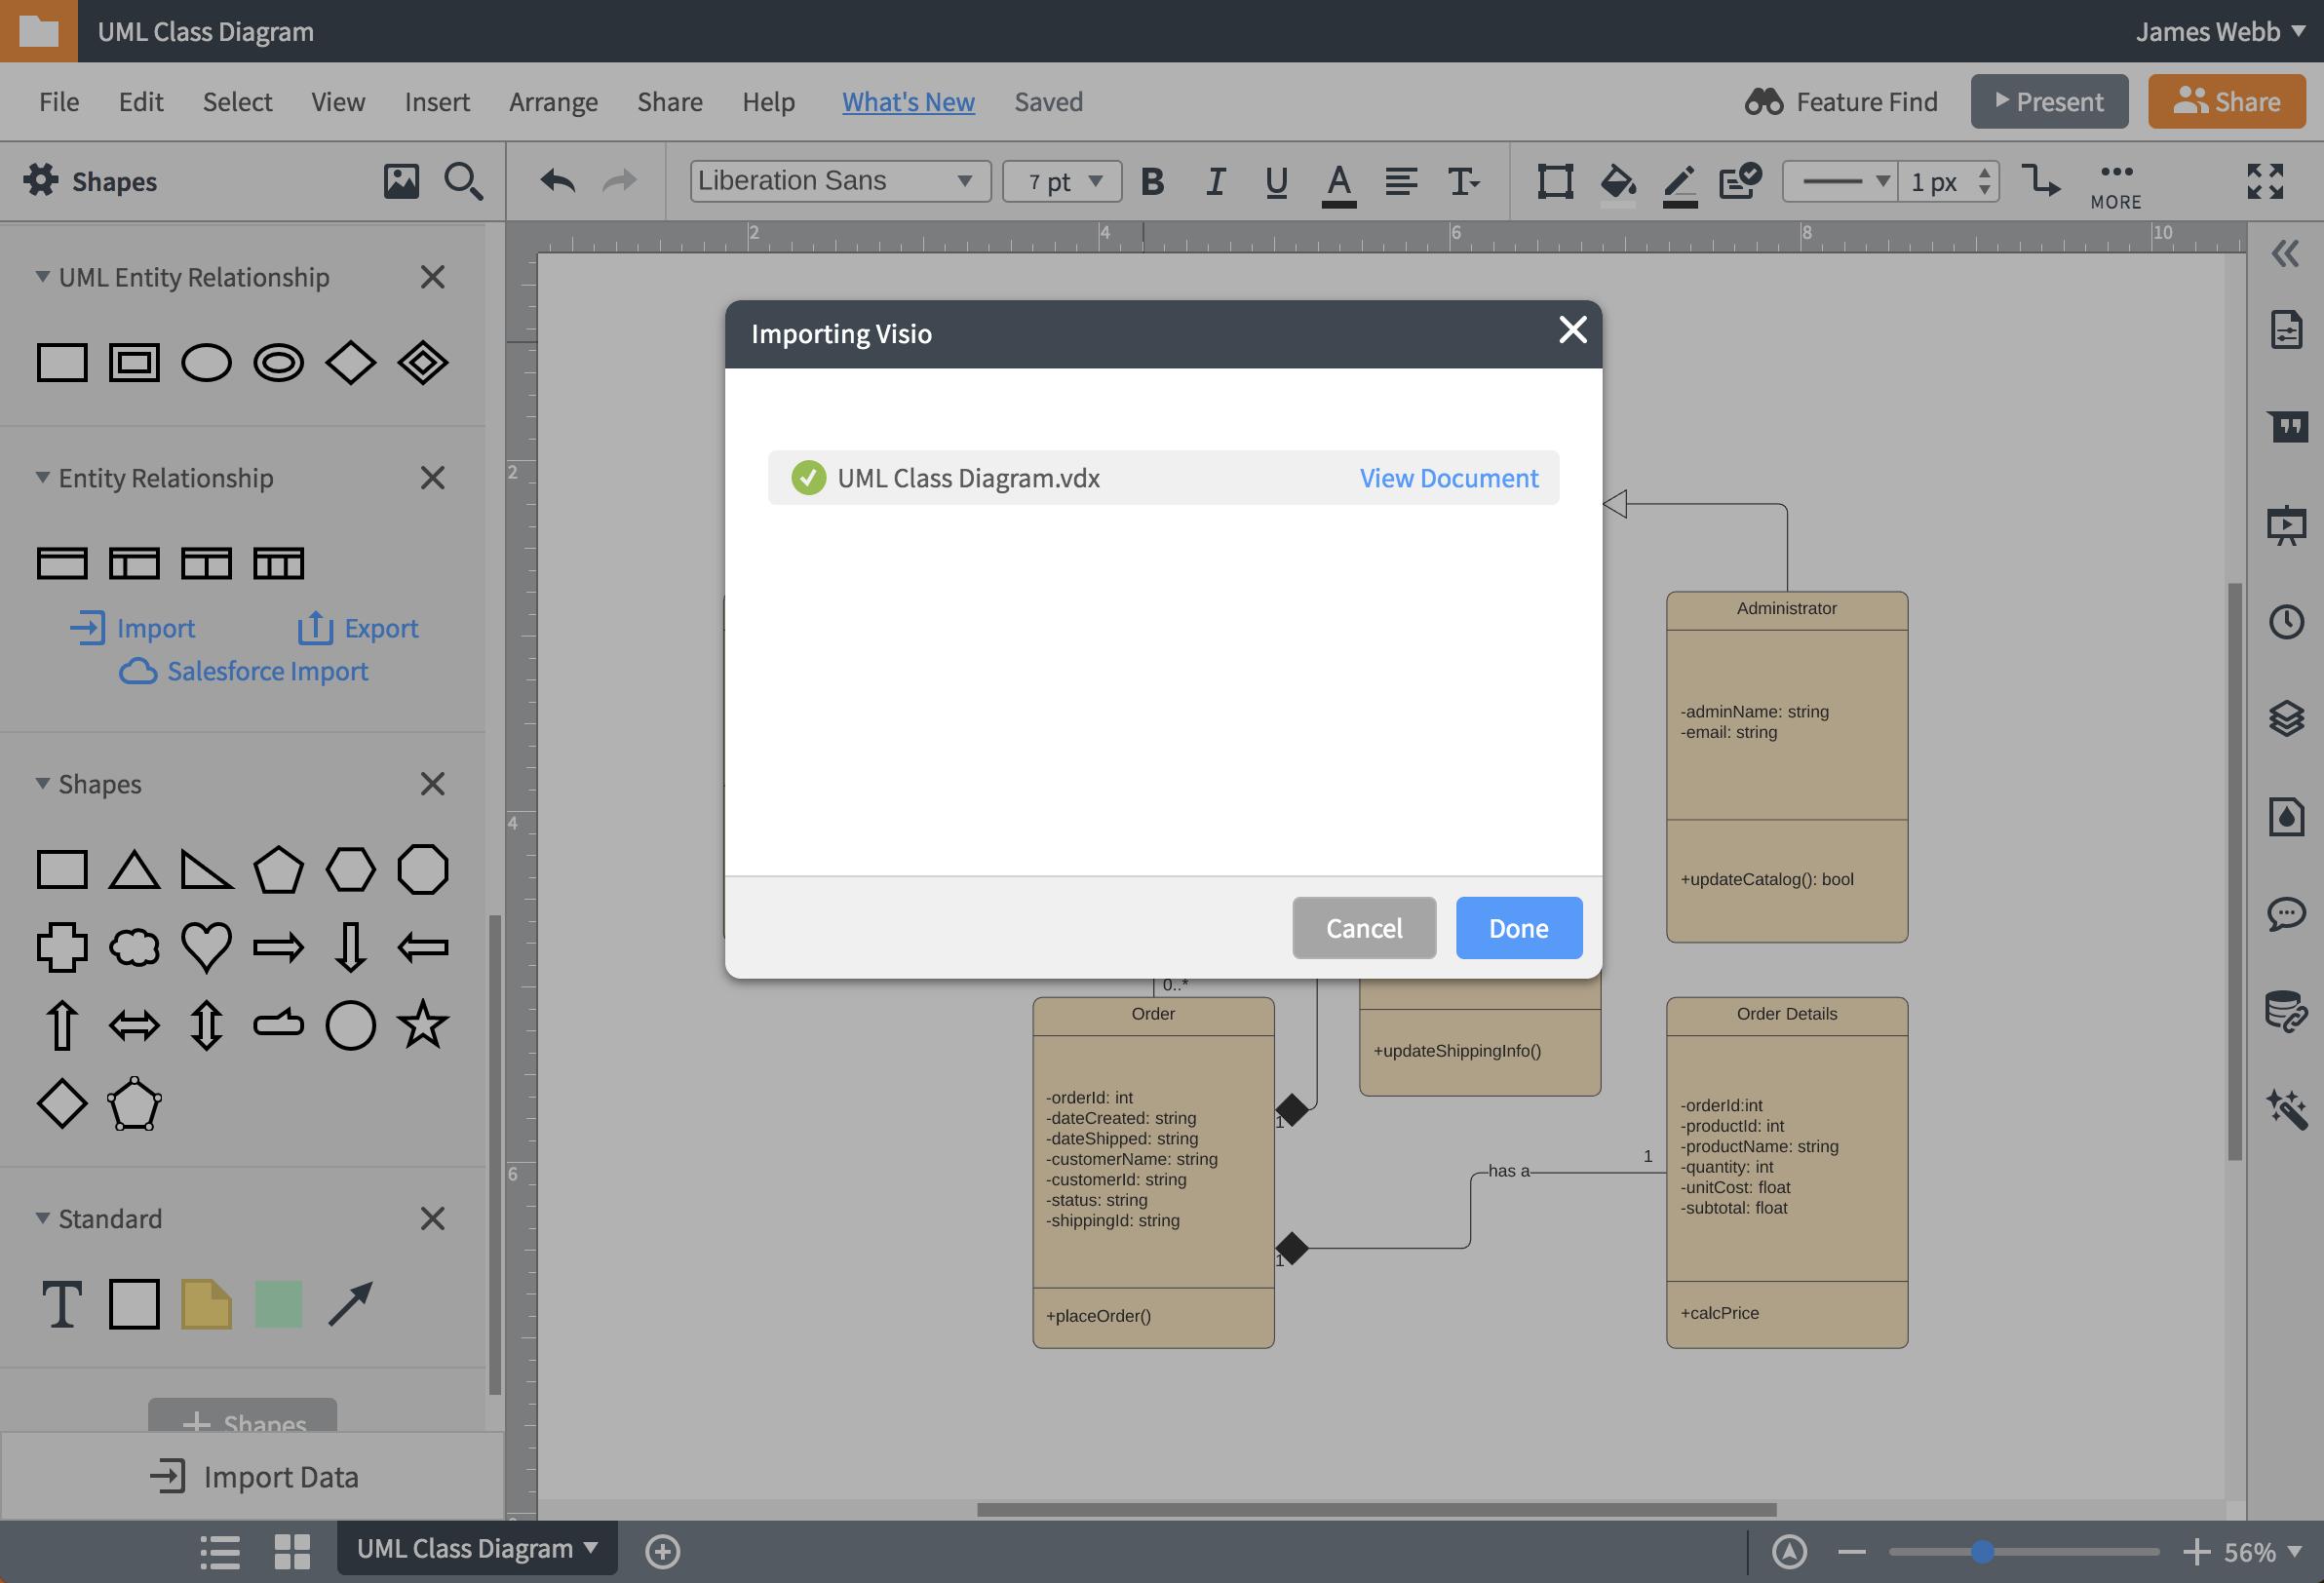 41 Stunning Free Diagram Software Mac Design Ideas Https Bacamajalah Com 41 Stunning Free Diag Free Graphic Design Software Graphic Design Software Diagram